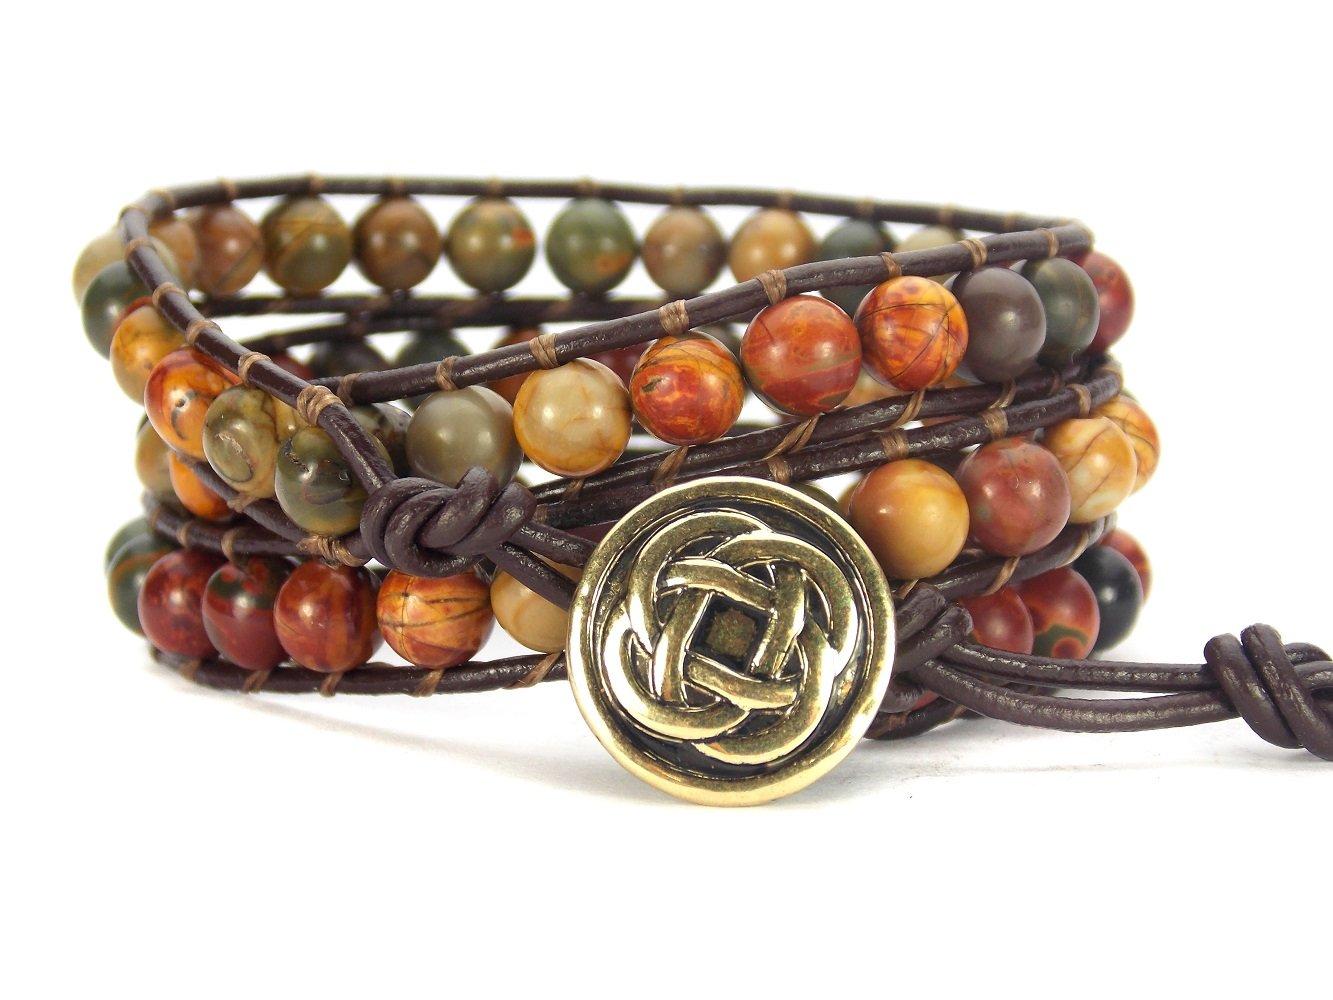 Carolyn Jane's Jewelry Celtic Knot Bracelet Leather Picasso Jasper Beaded Wrap (Goldish Bronze Button) by Carolyn Jane's Jewelry